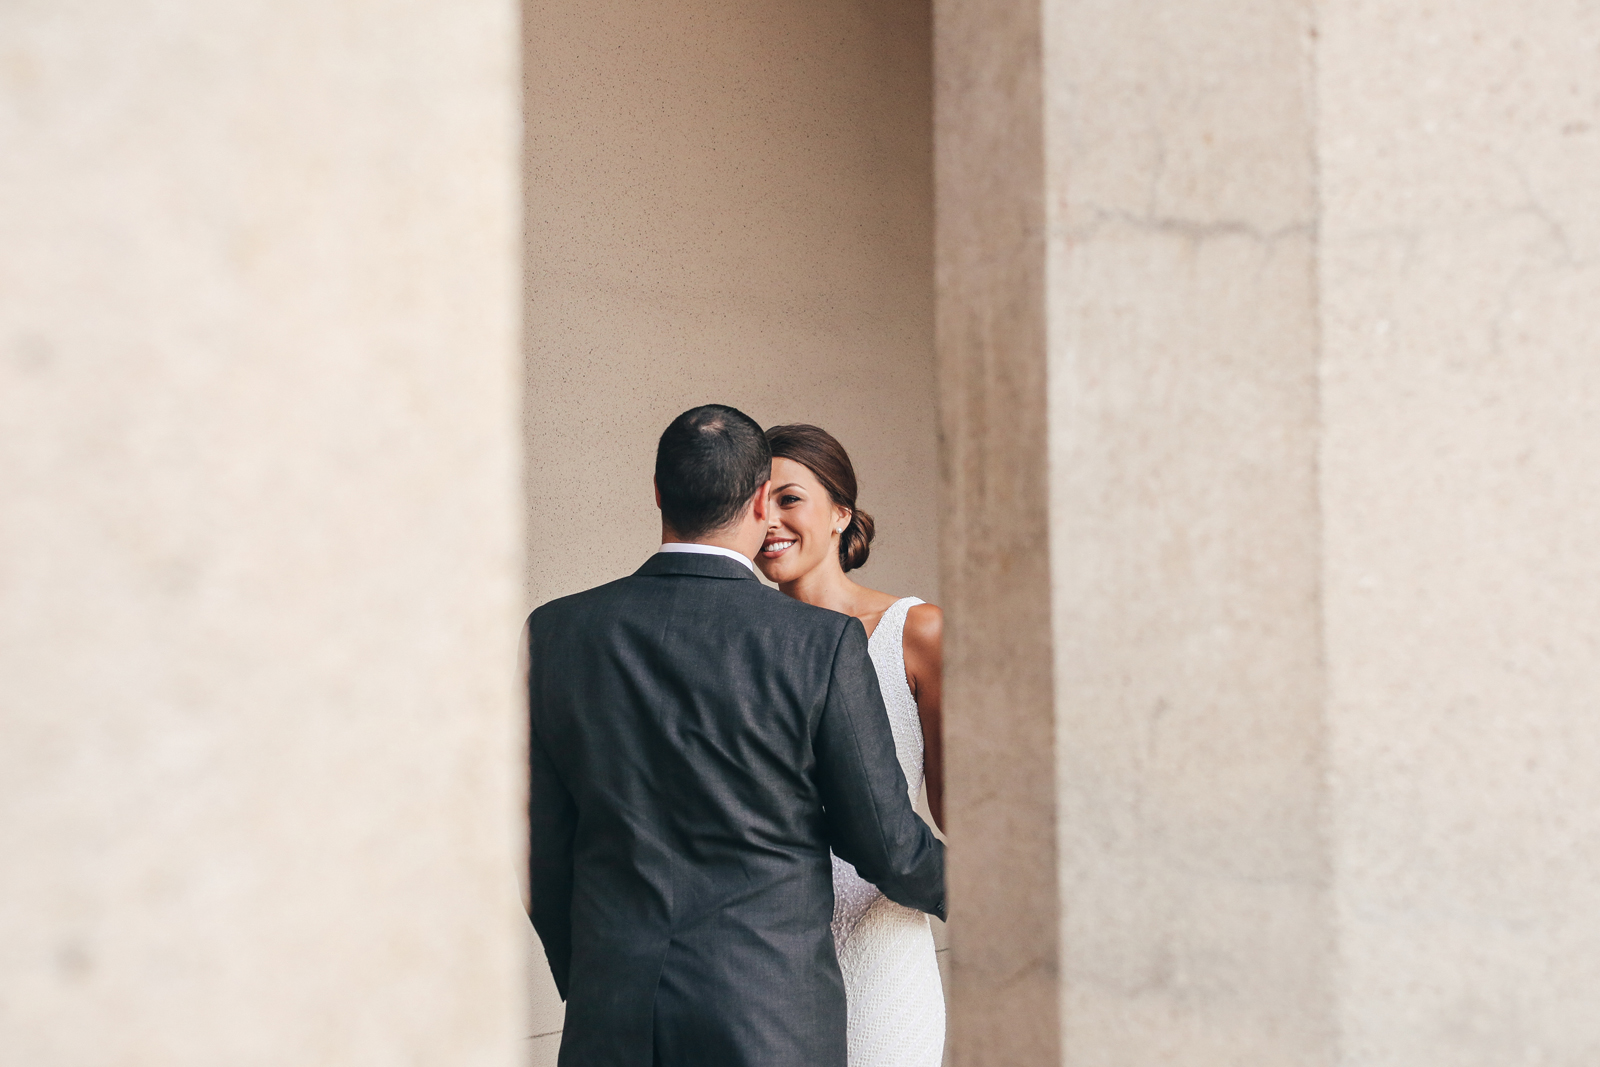 temple_emmanuel_jewish_wedding_san_francisco_ca_sarah_andrew_ebony_siovhan_bokeh_photography_17.jpg